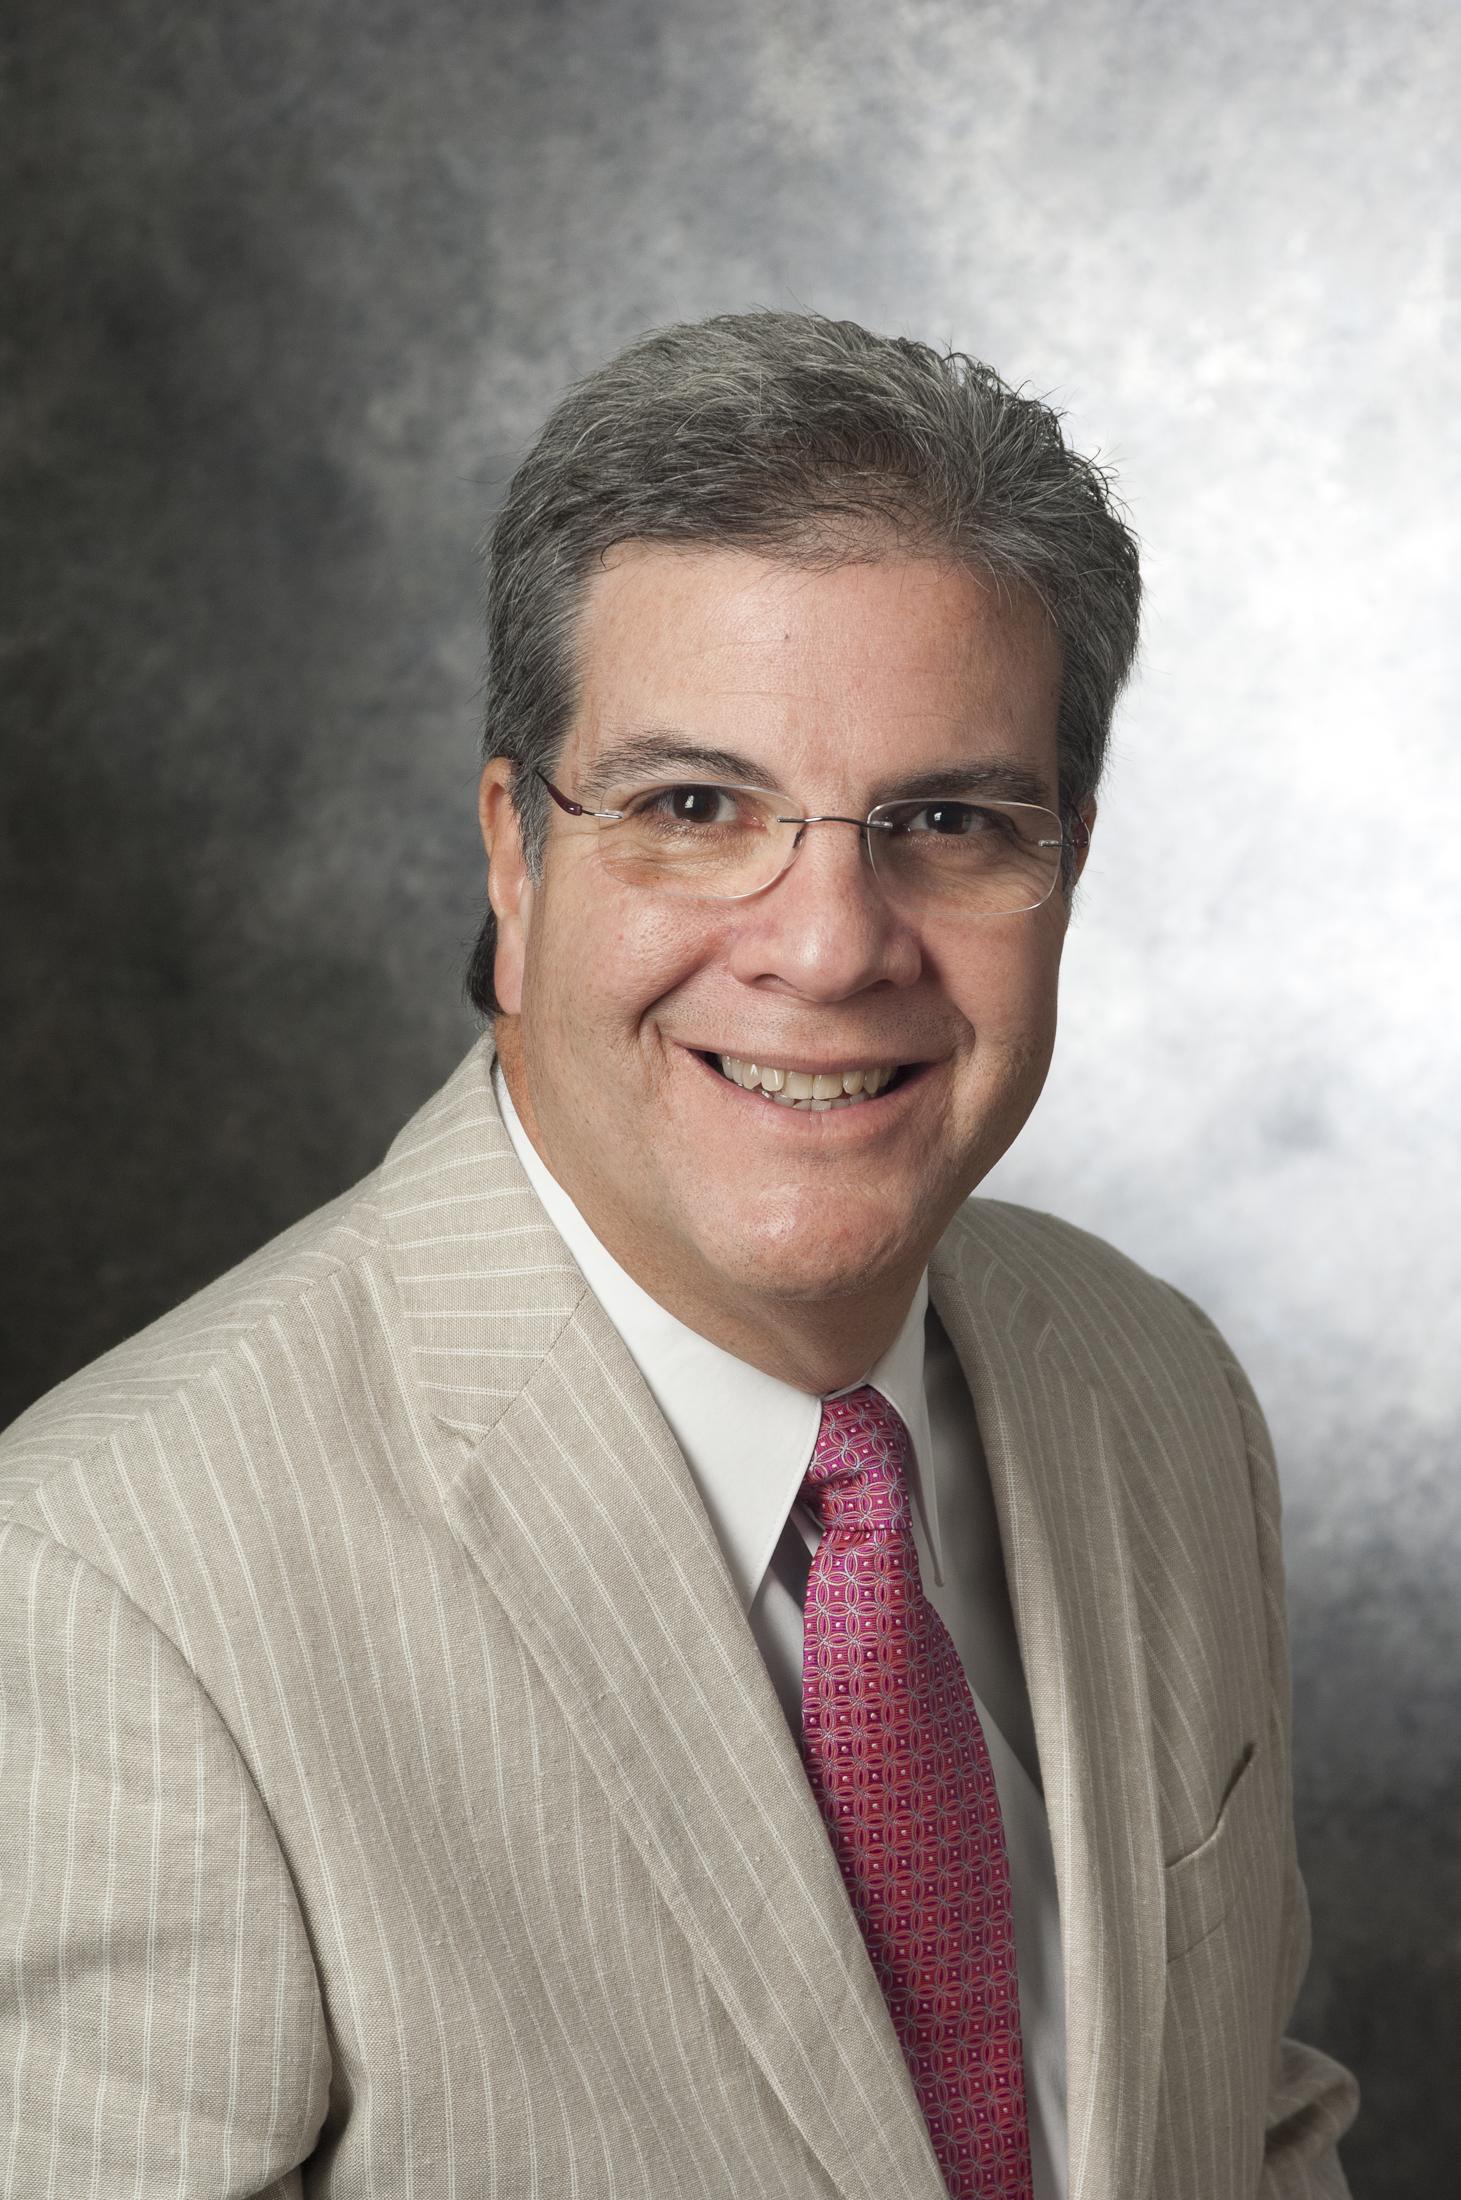 Carlos F. Cardoza-Orlandi, Ph.D.